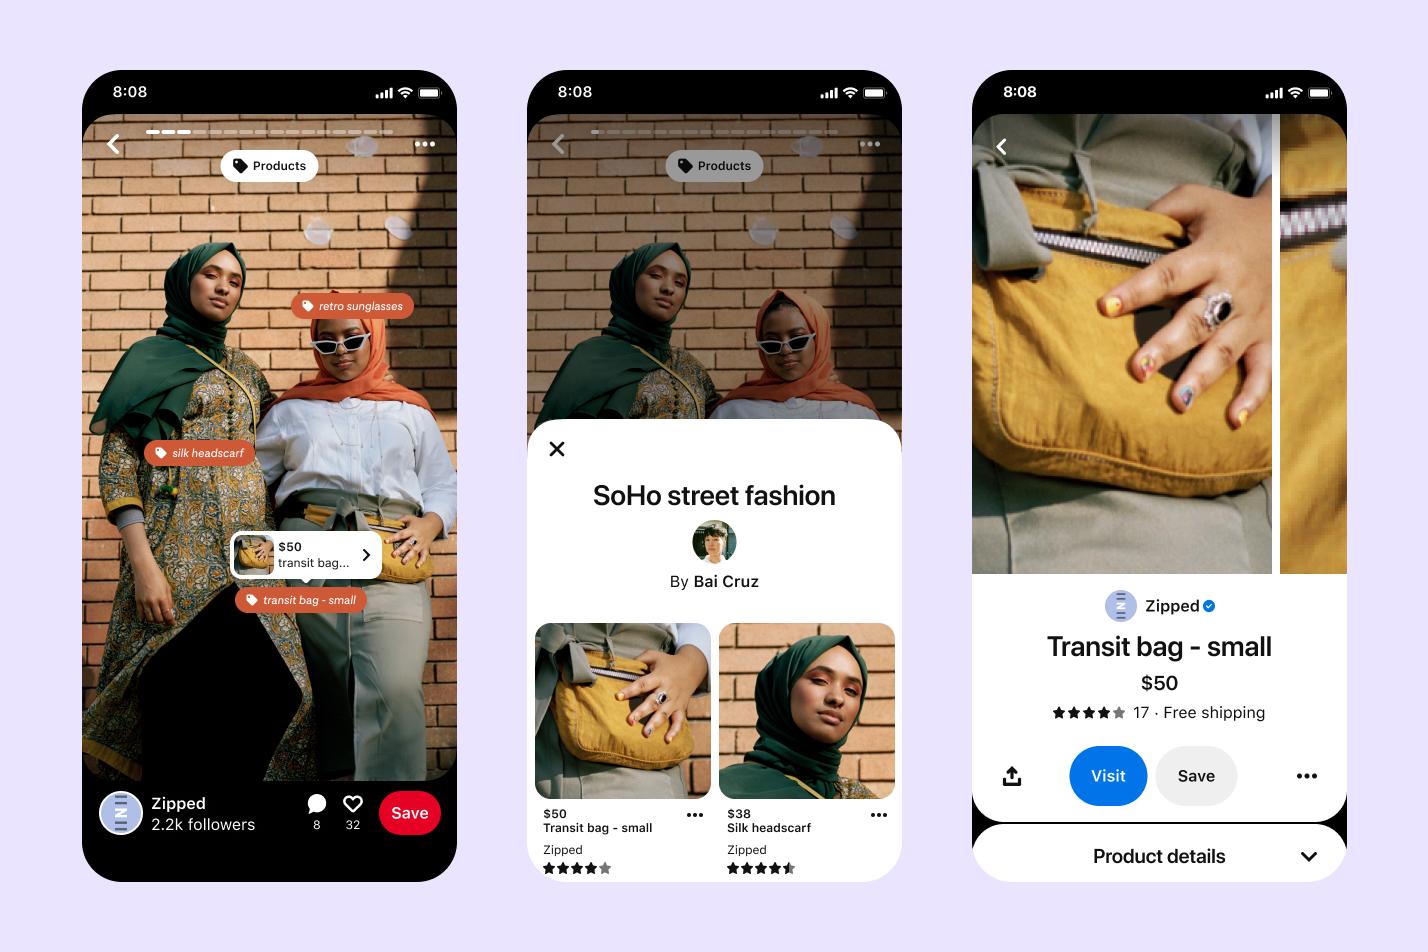 Pinterest is giving creators ways to make money on the platform